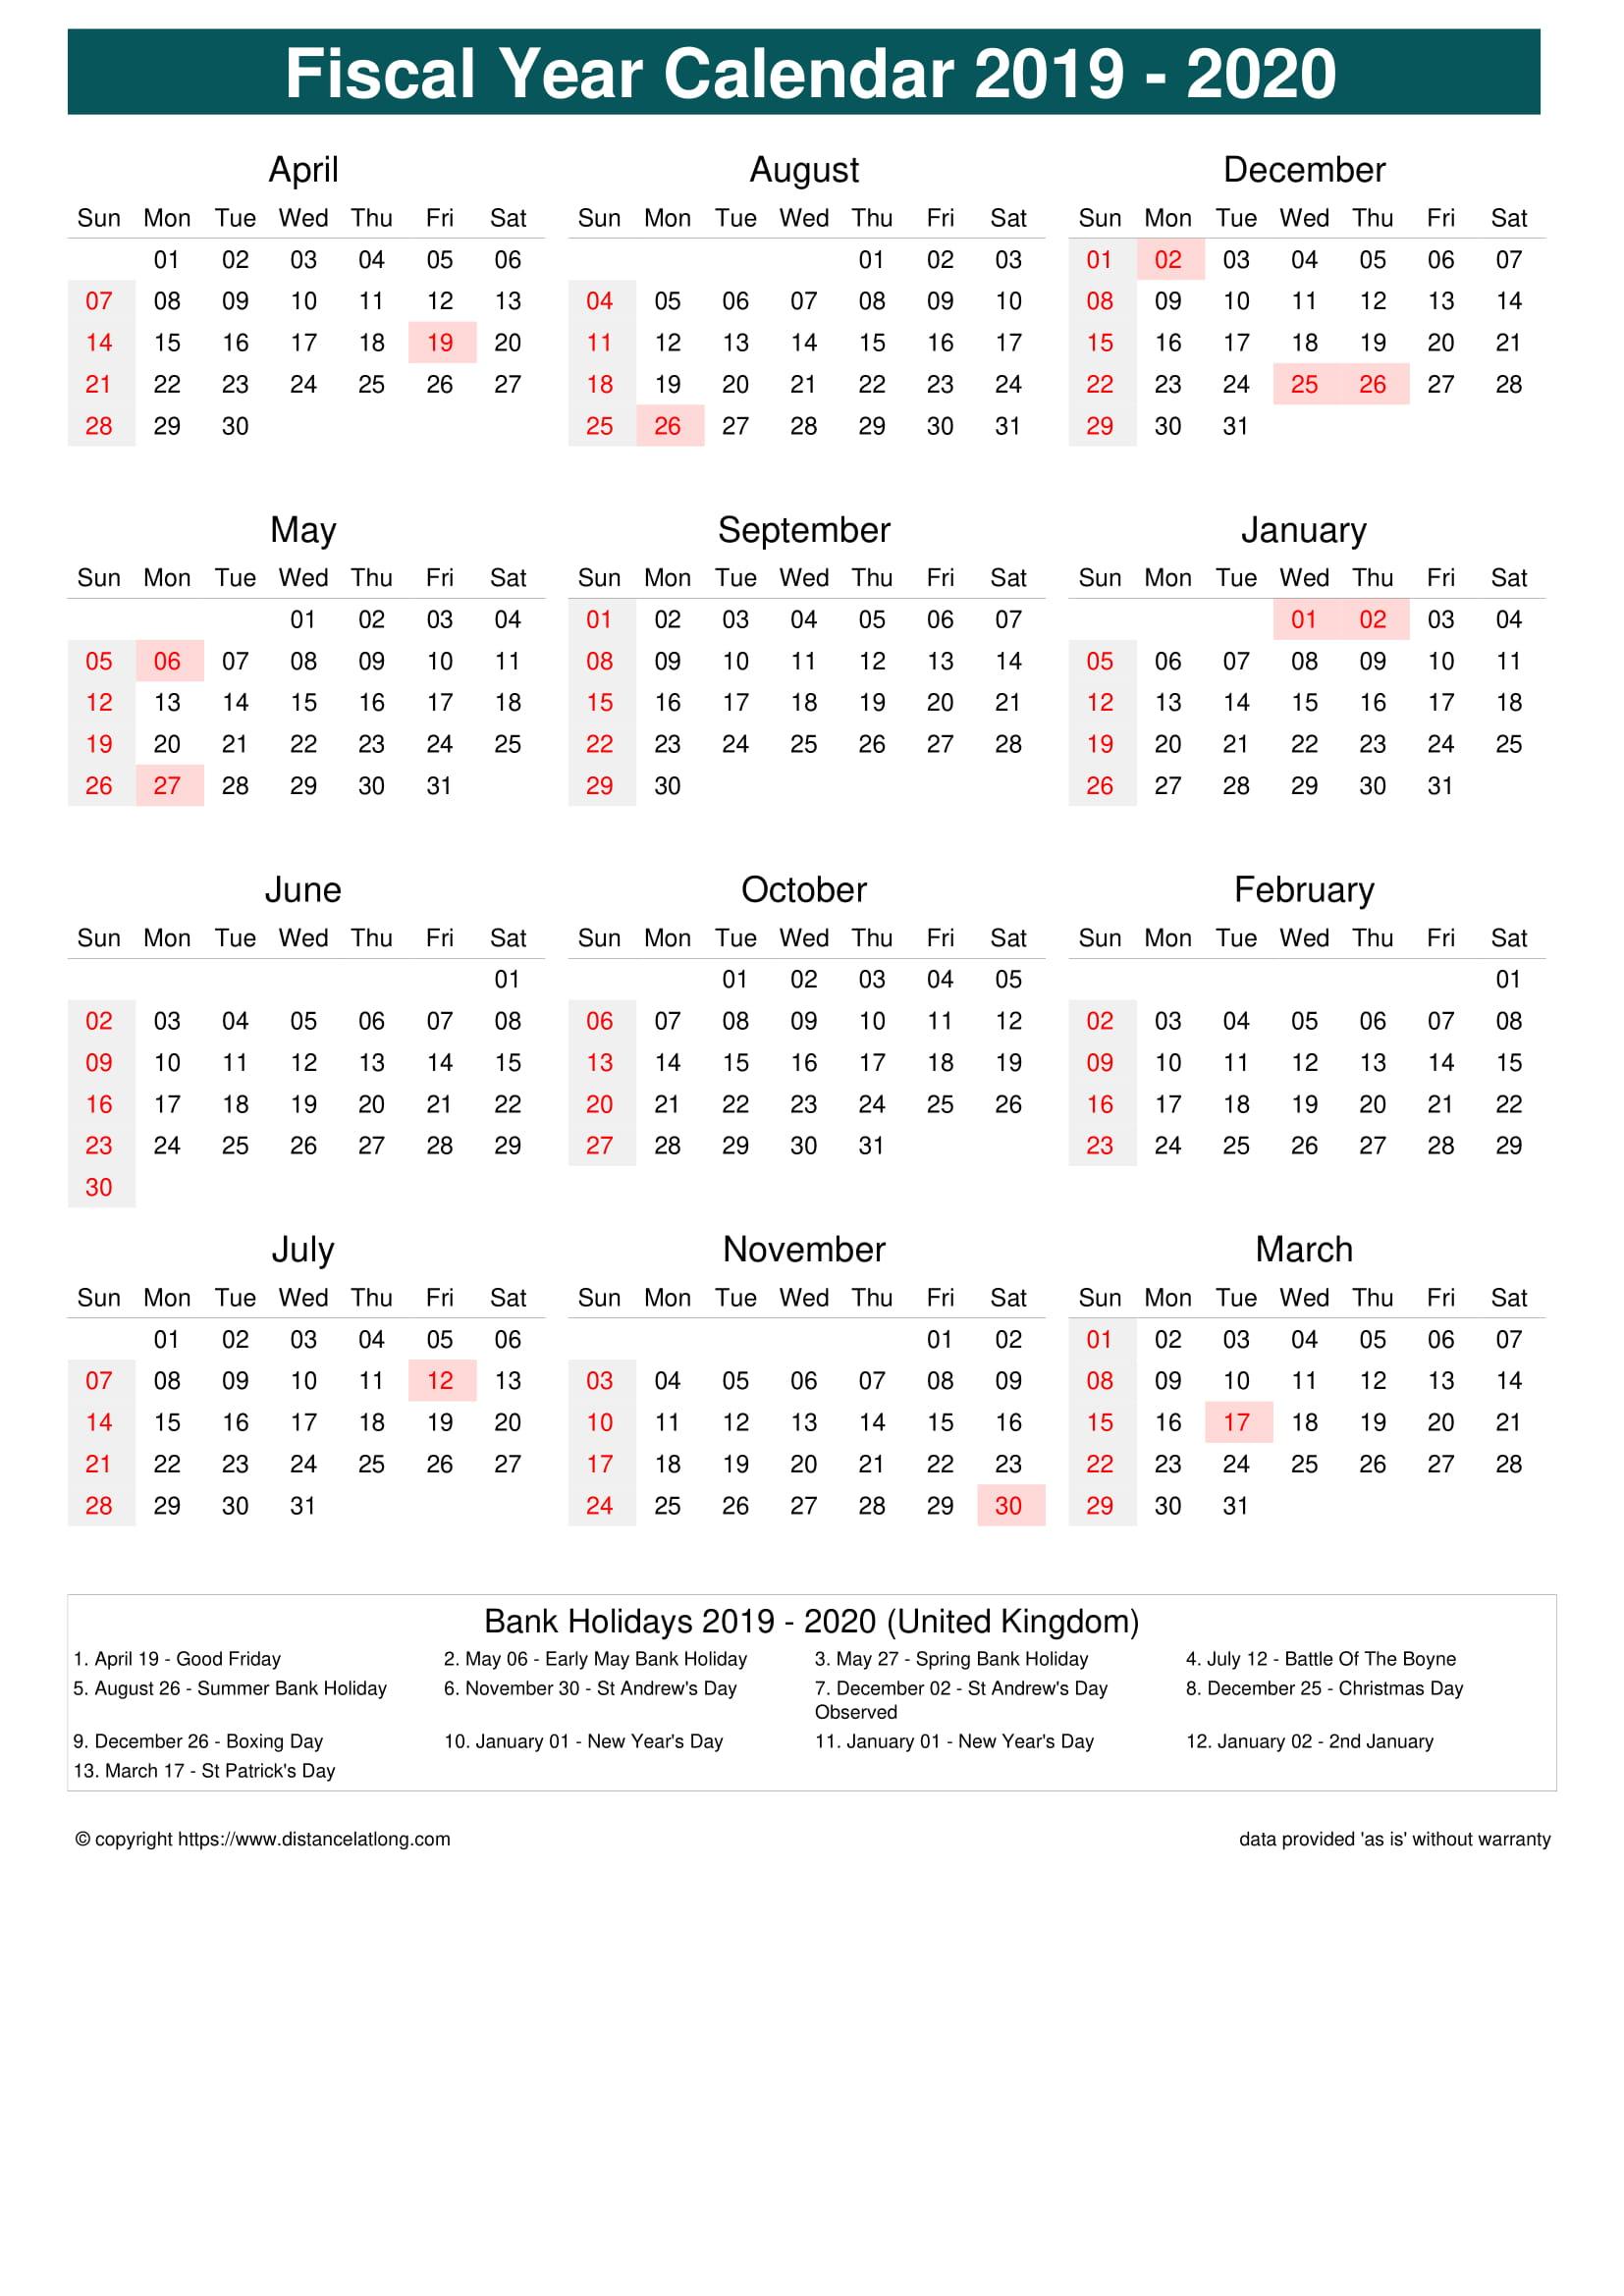 United Kingdom Holiday Calendar 2020 JPG Templates - distancelatlong.com